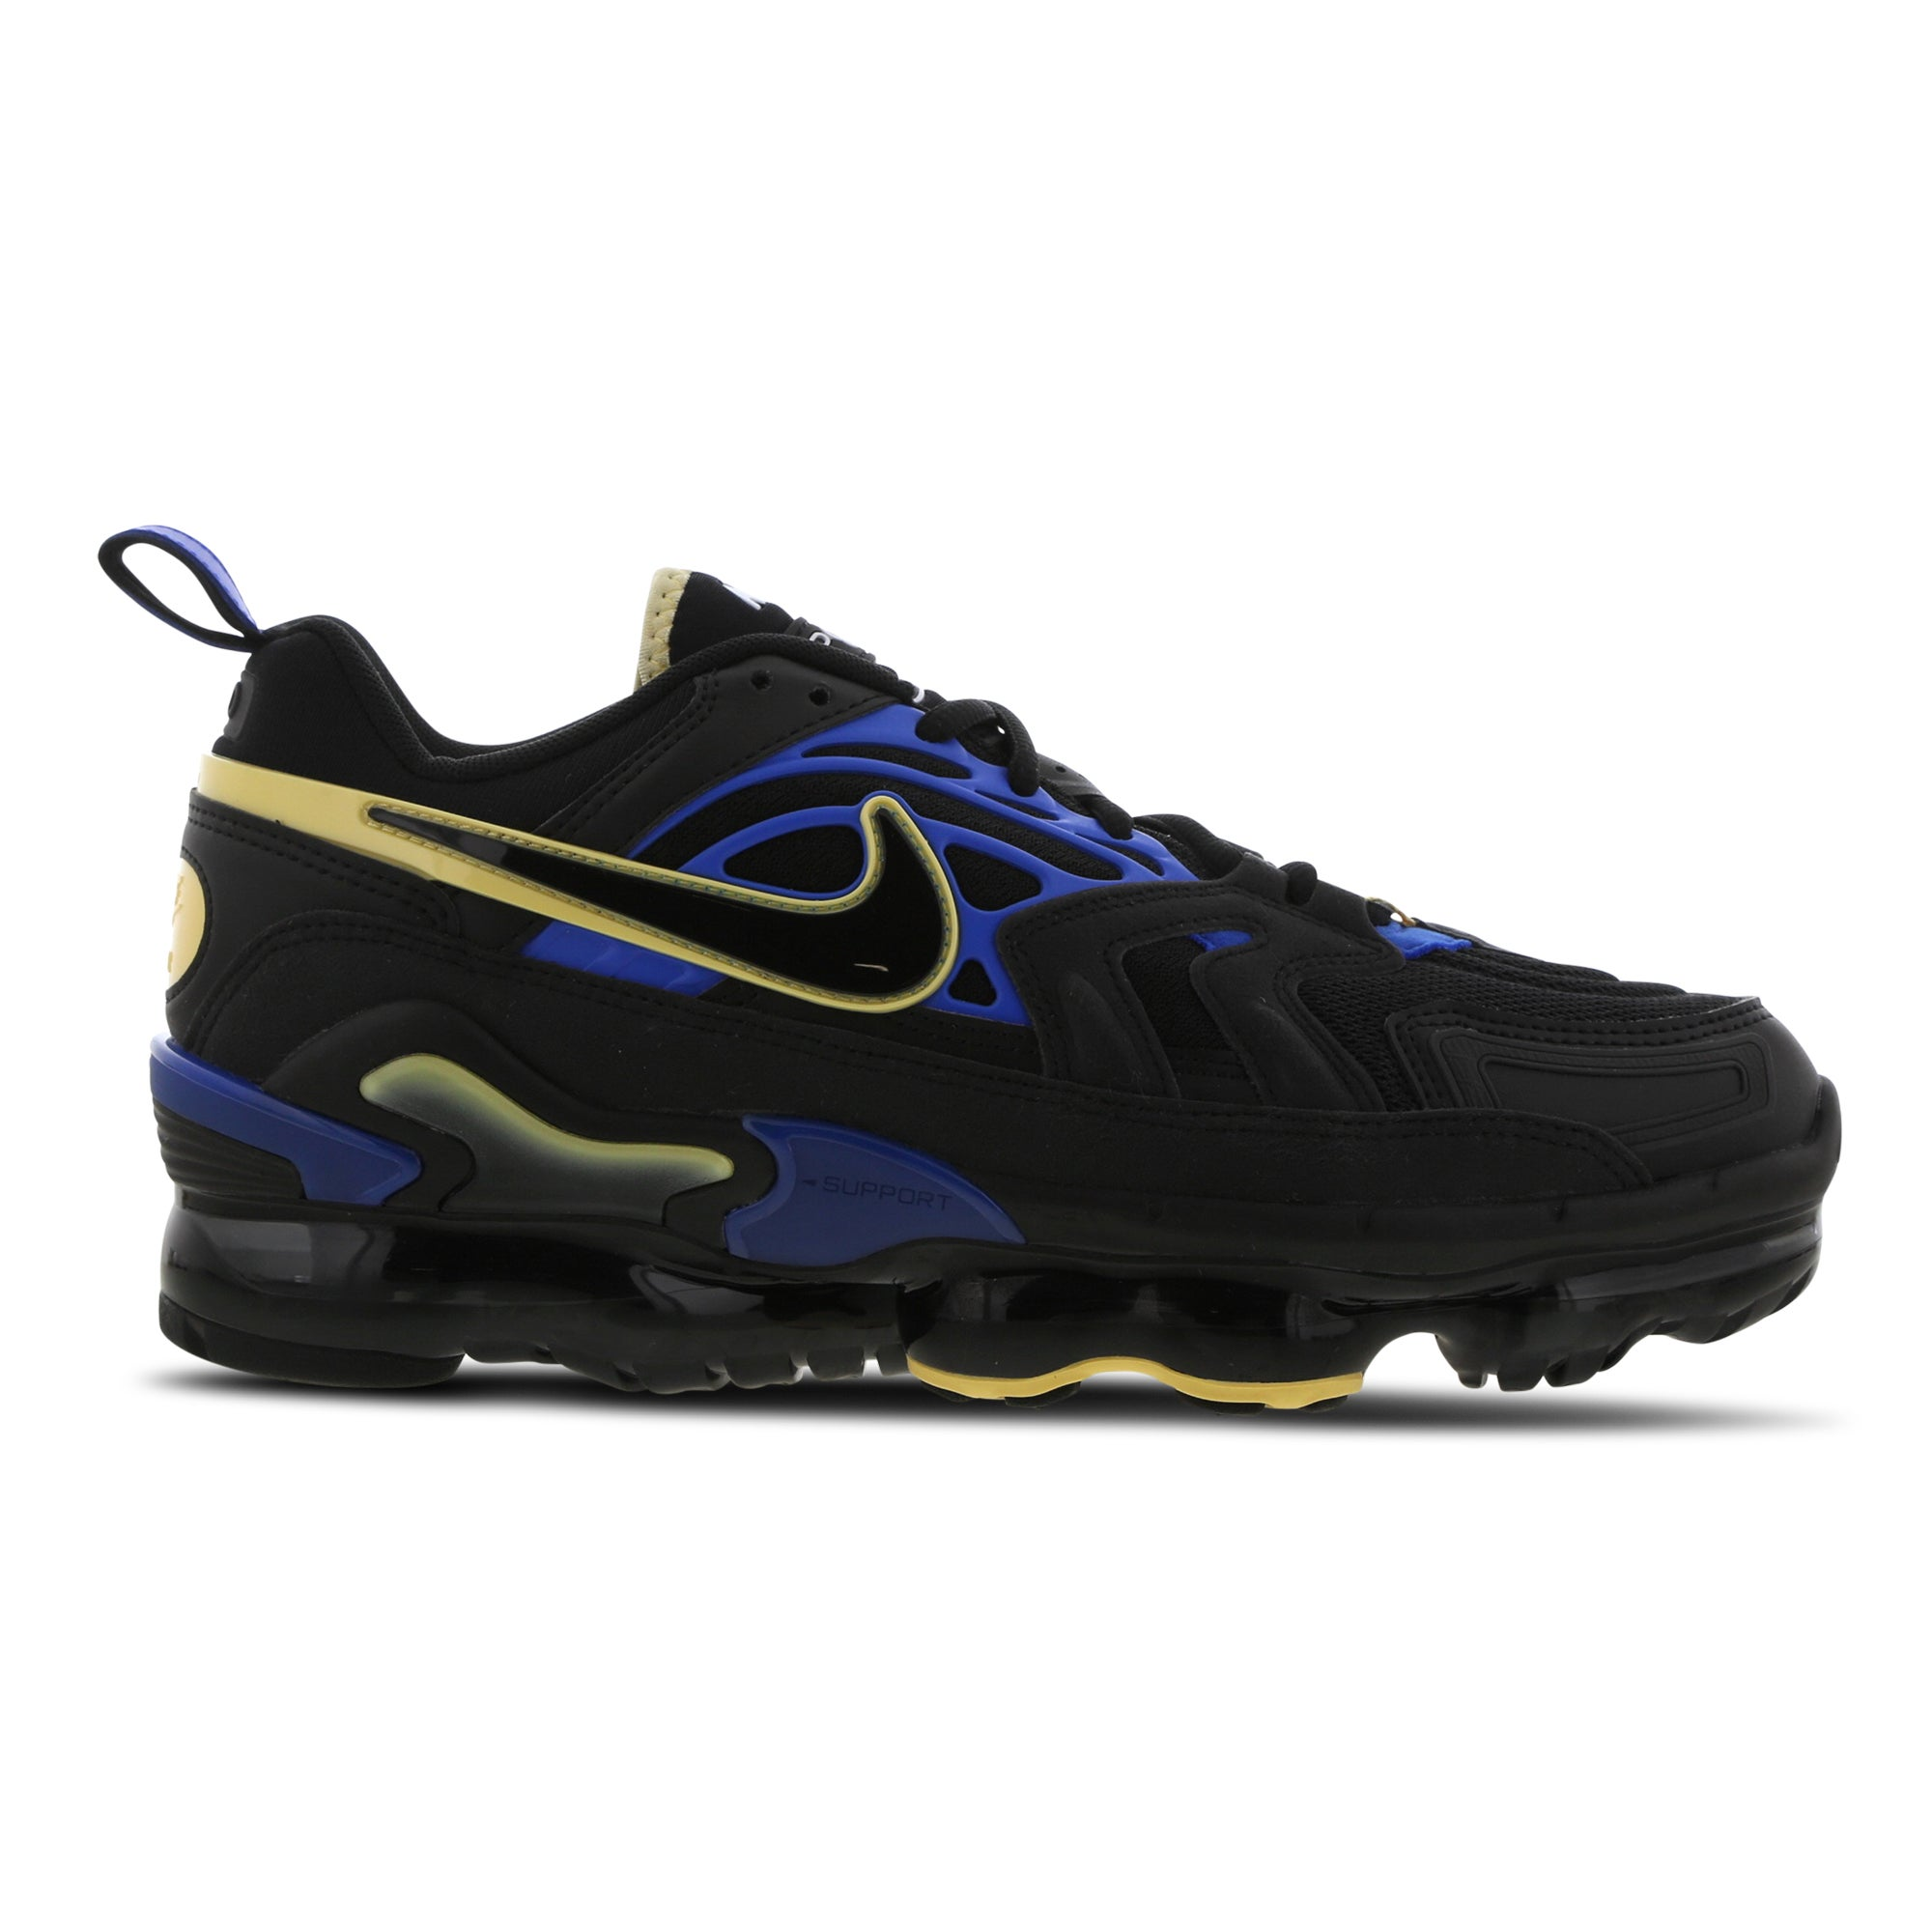 Nike Air Vapormax Evo Shoes